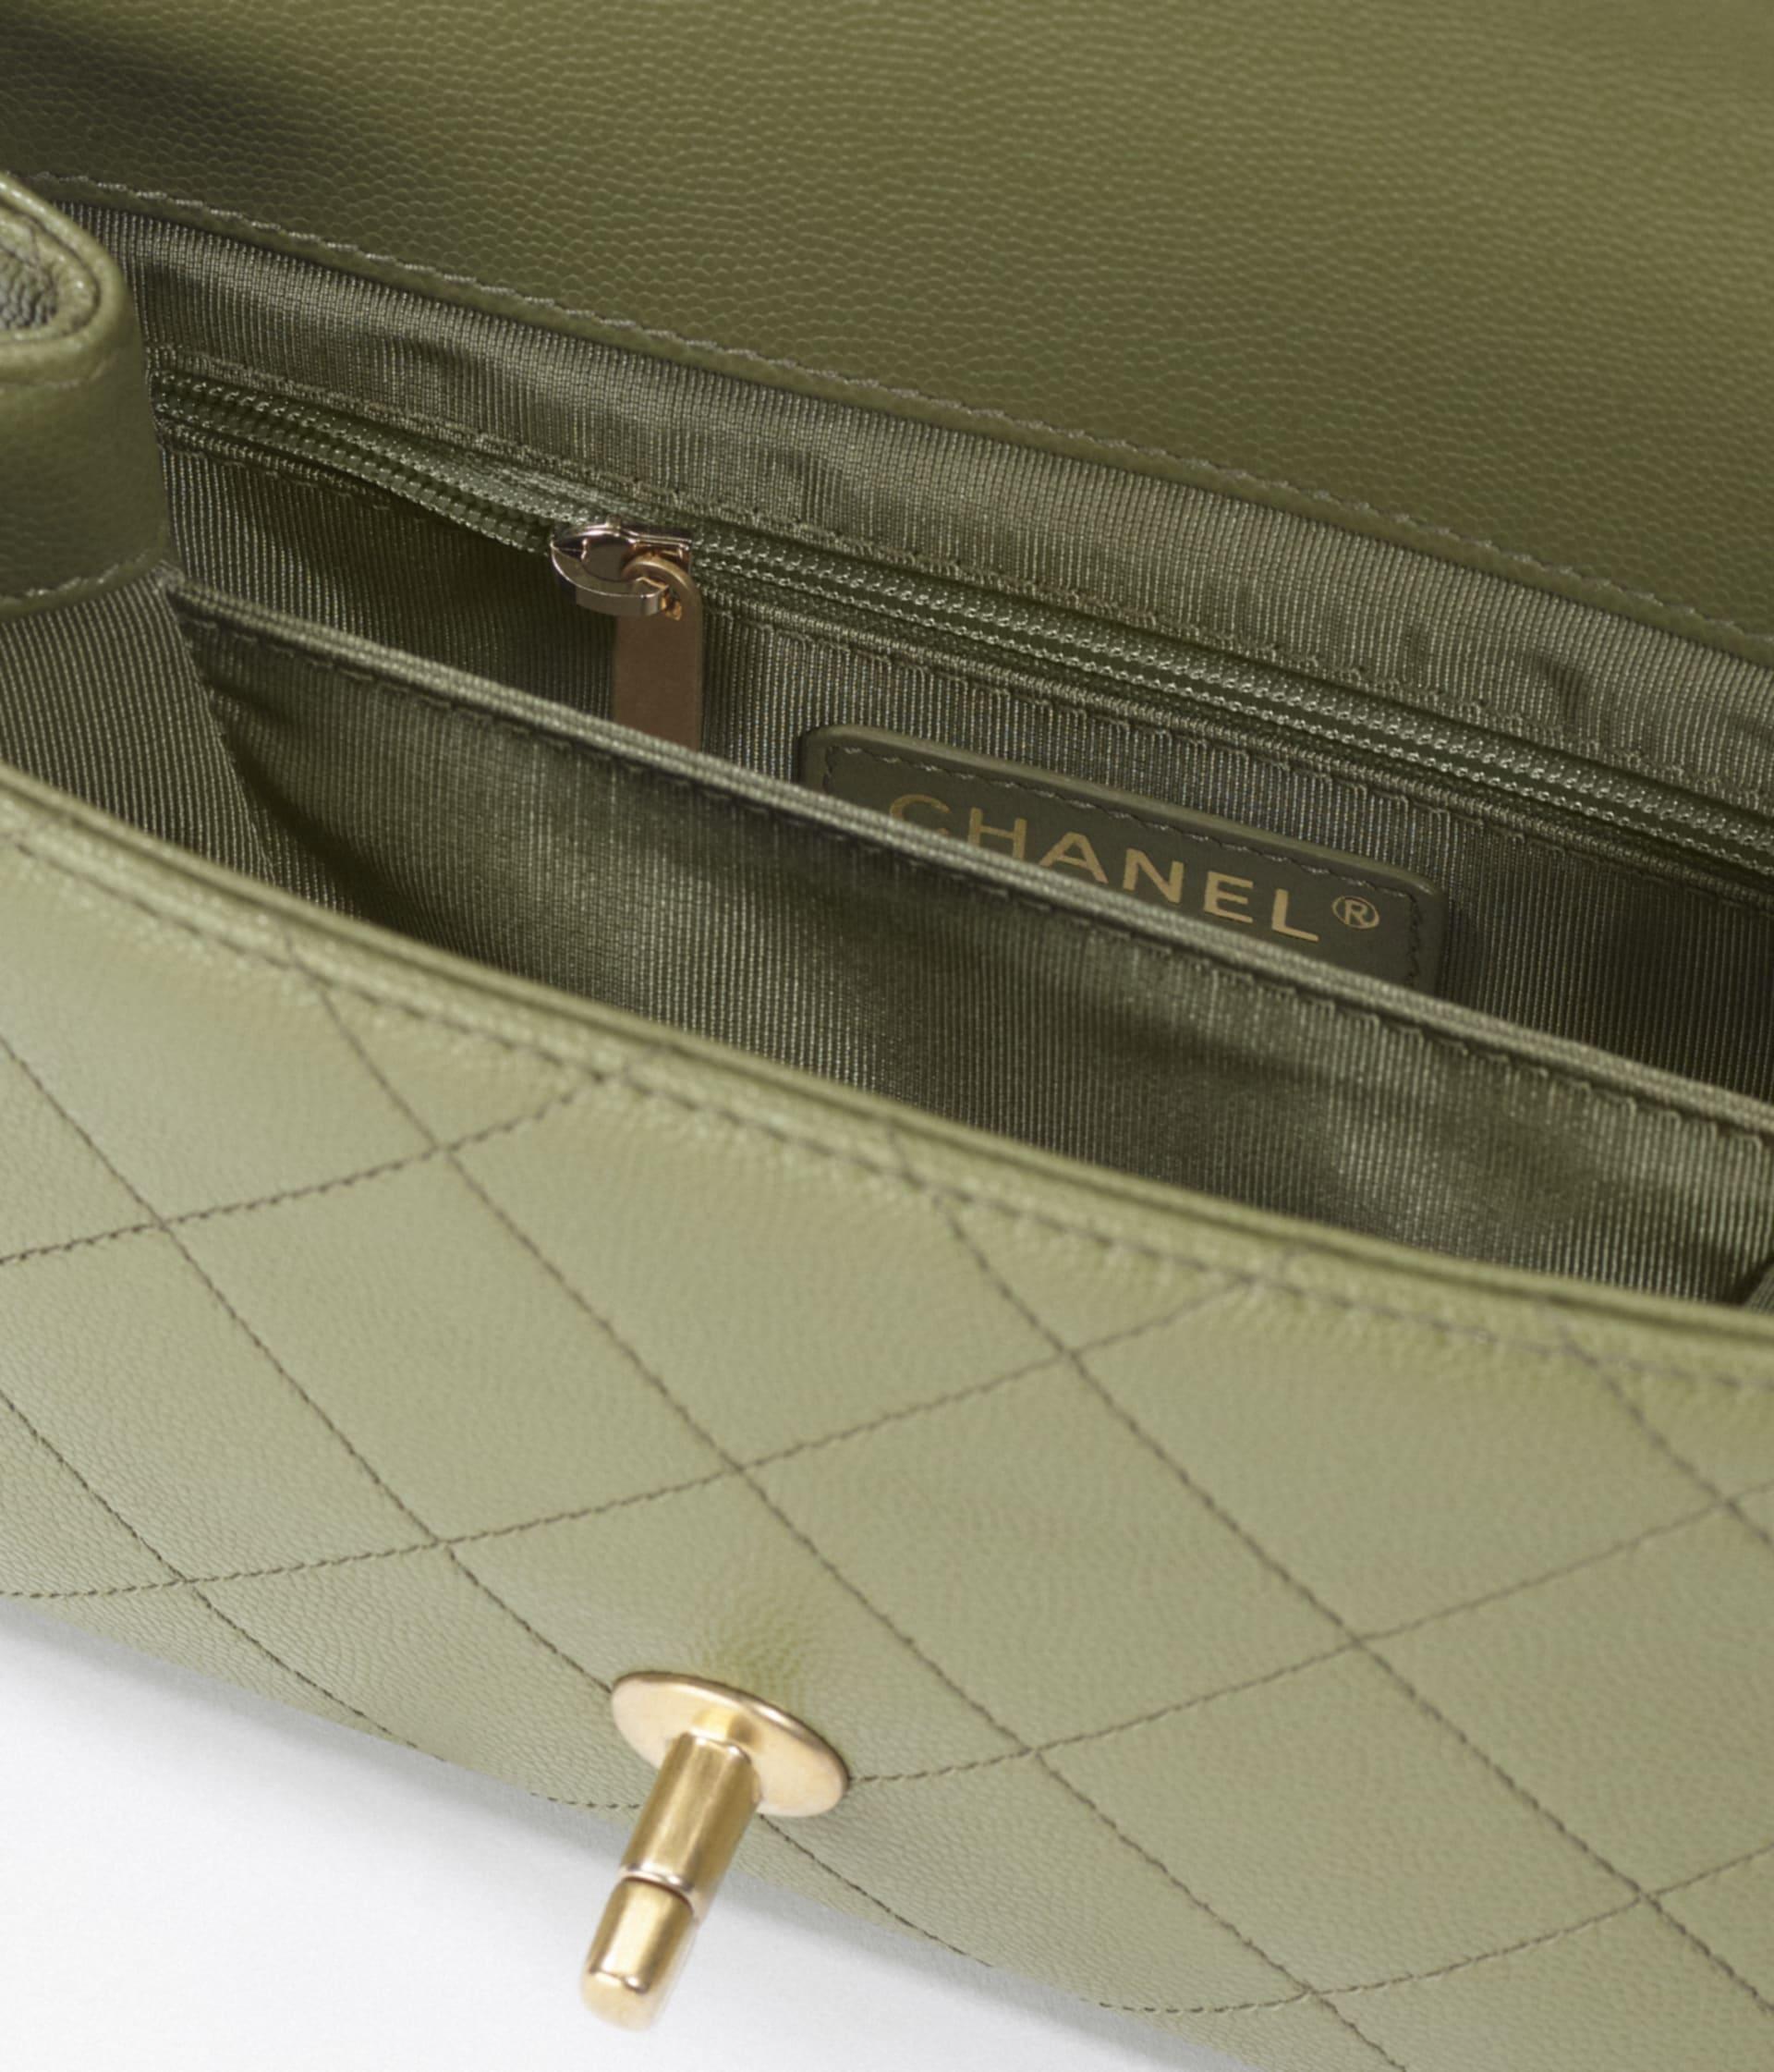 image 3 - Mini Flap Bag - Grained Calfskin & Gold-Tone Metal - Green